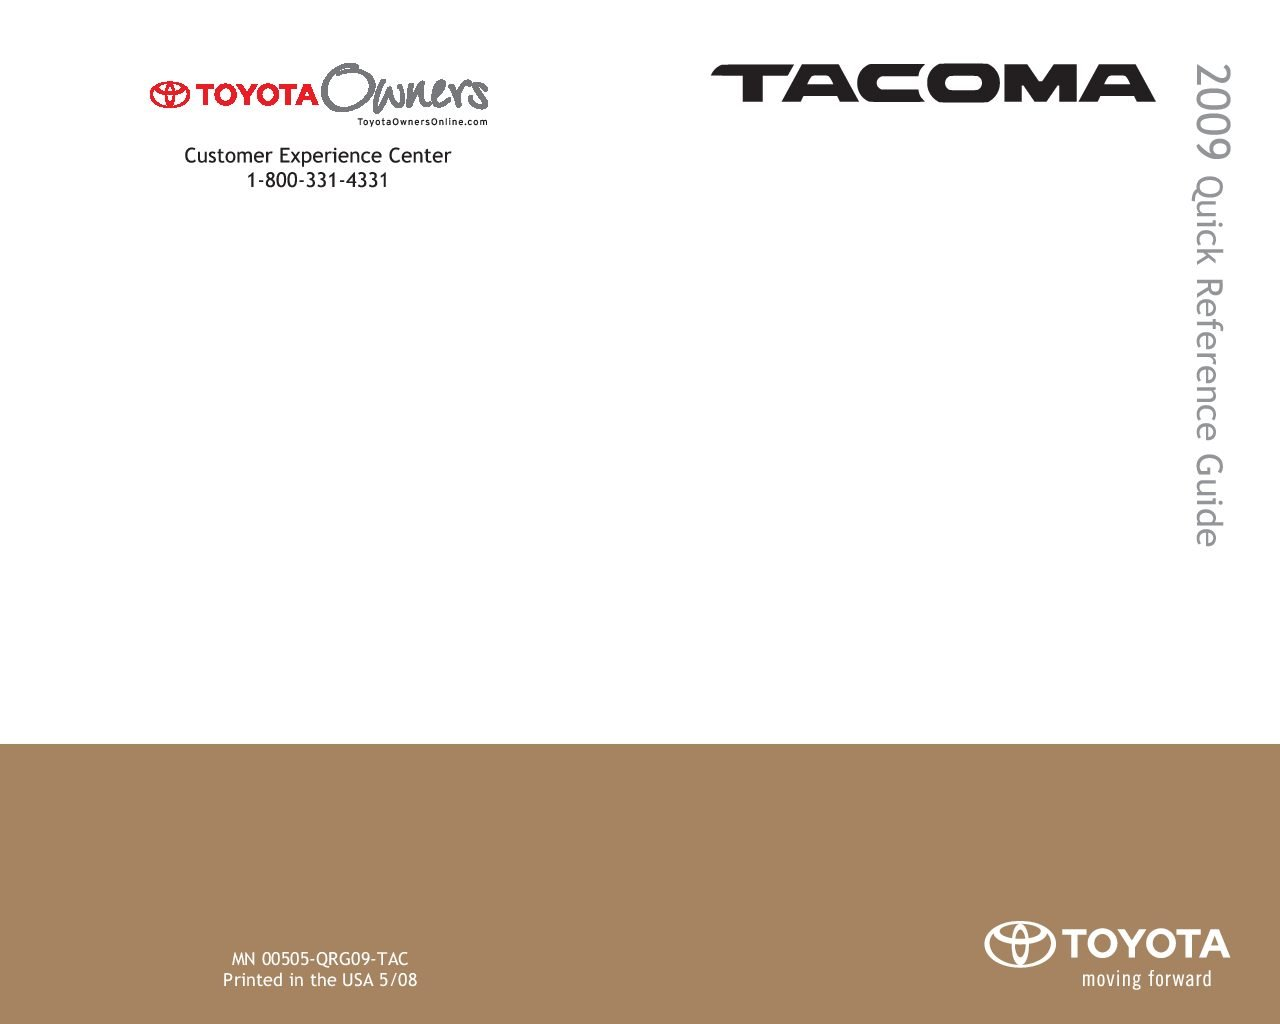 2009 toyota tacoma owners manual just give me the damn manual rh justgivemethedamnmanual com 2008 tacoma owners manual pdf 2009 tacoma service manual pdf